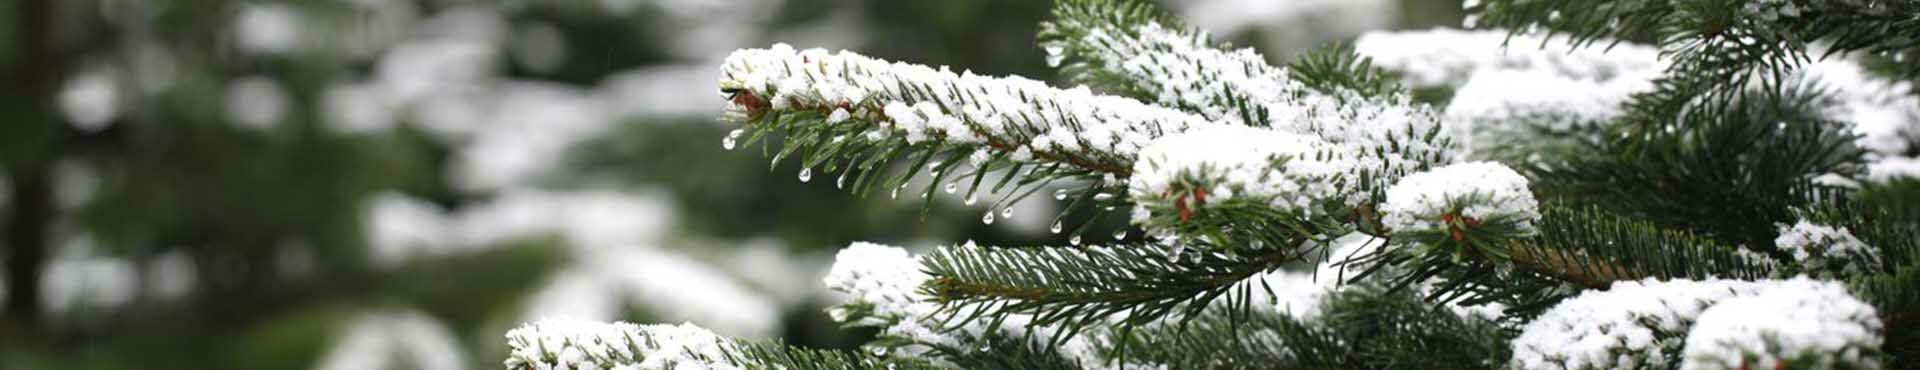 Wat te doen met je kerstboom na Kerst?